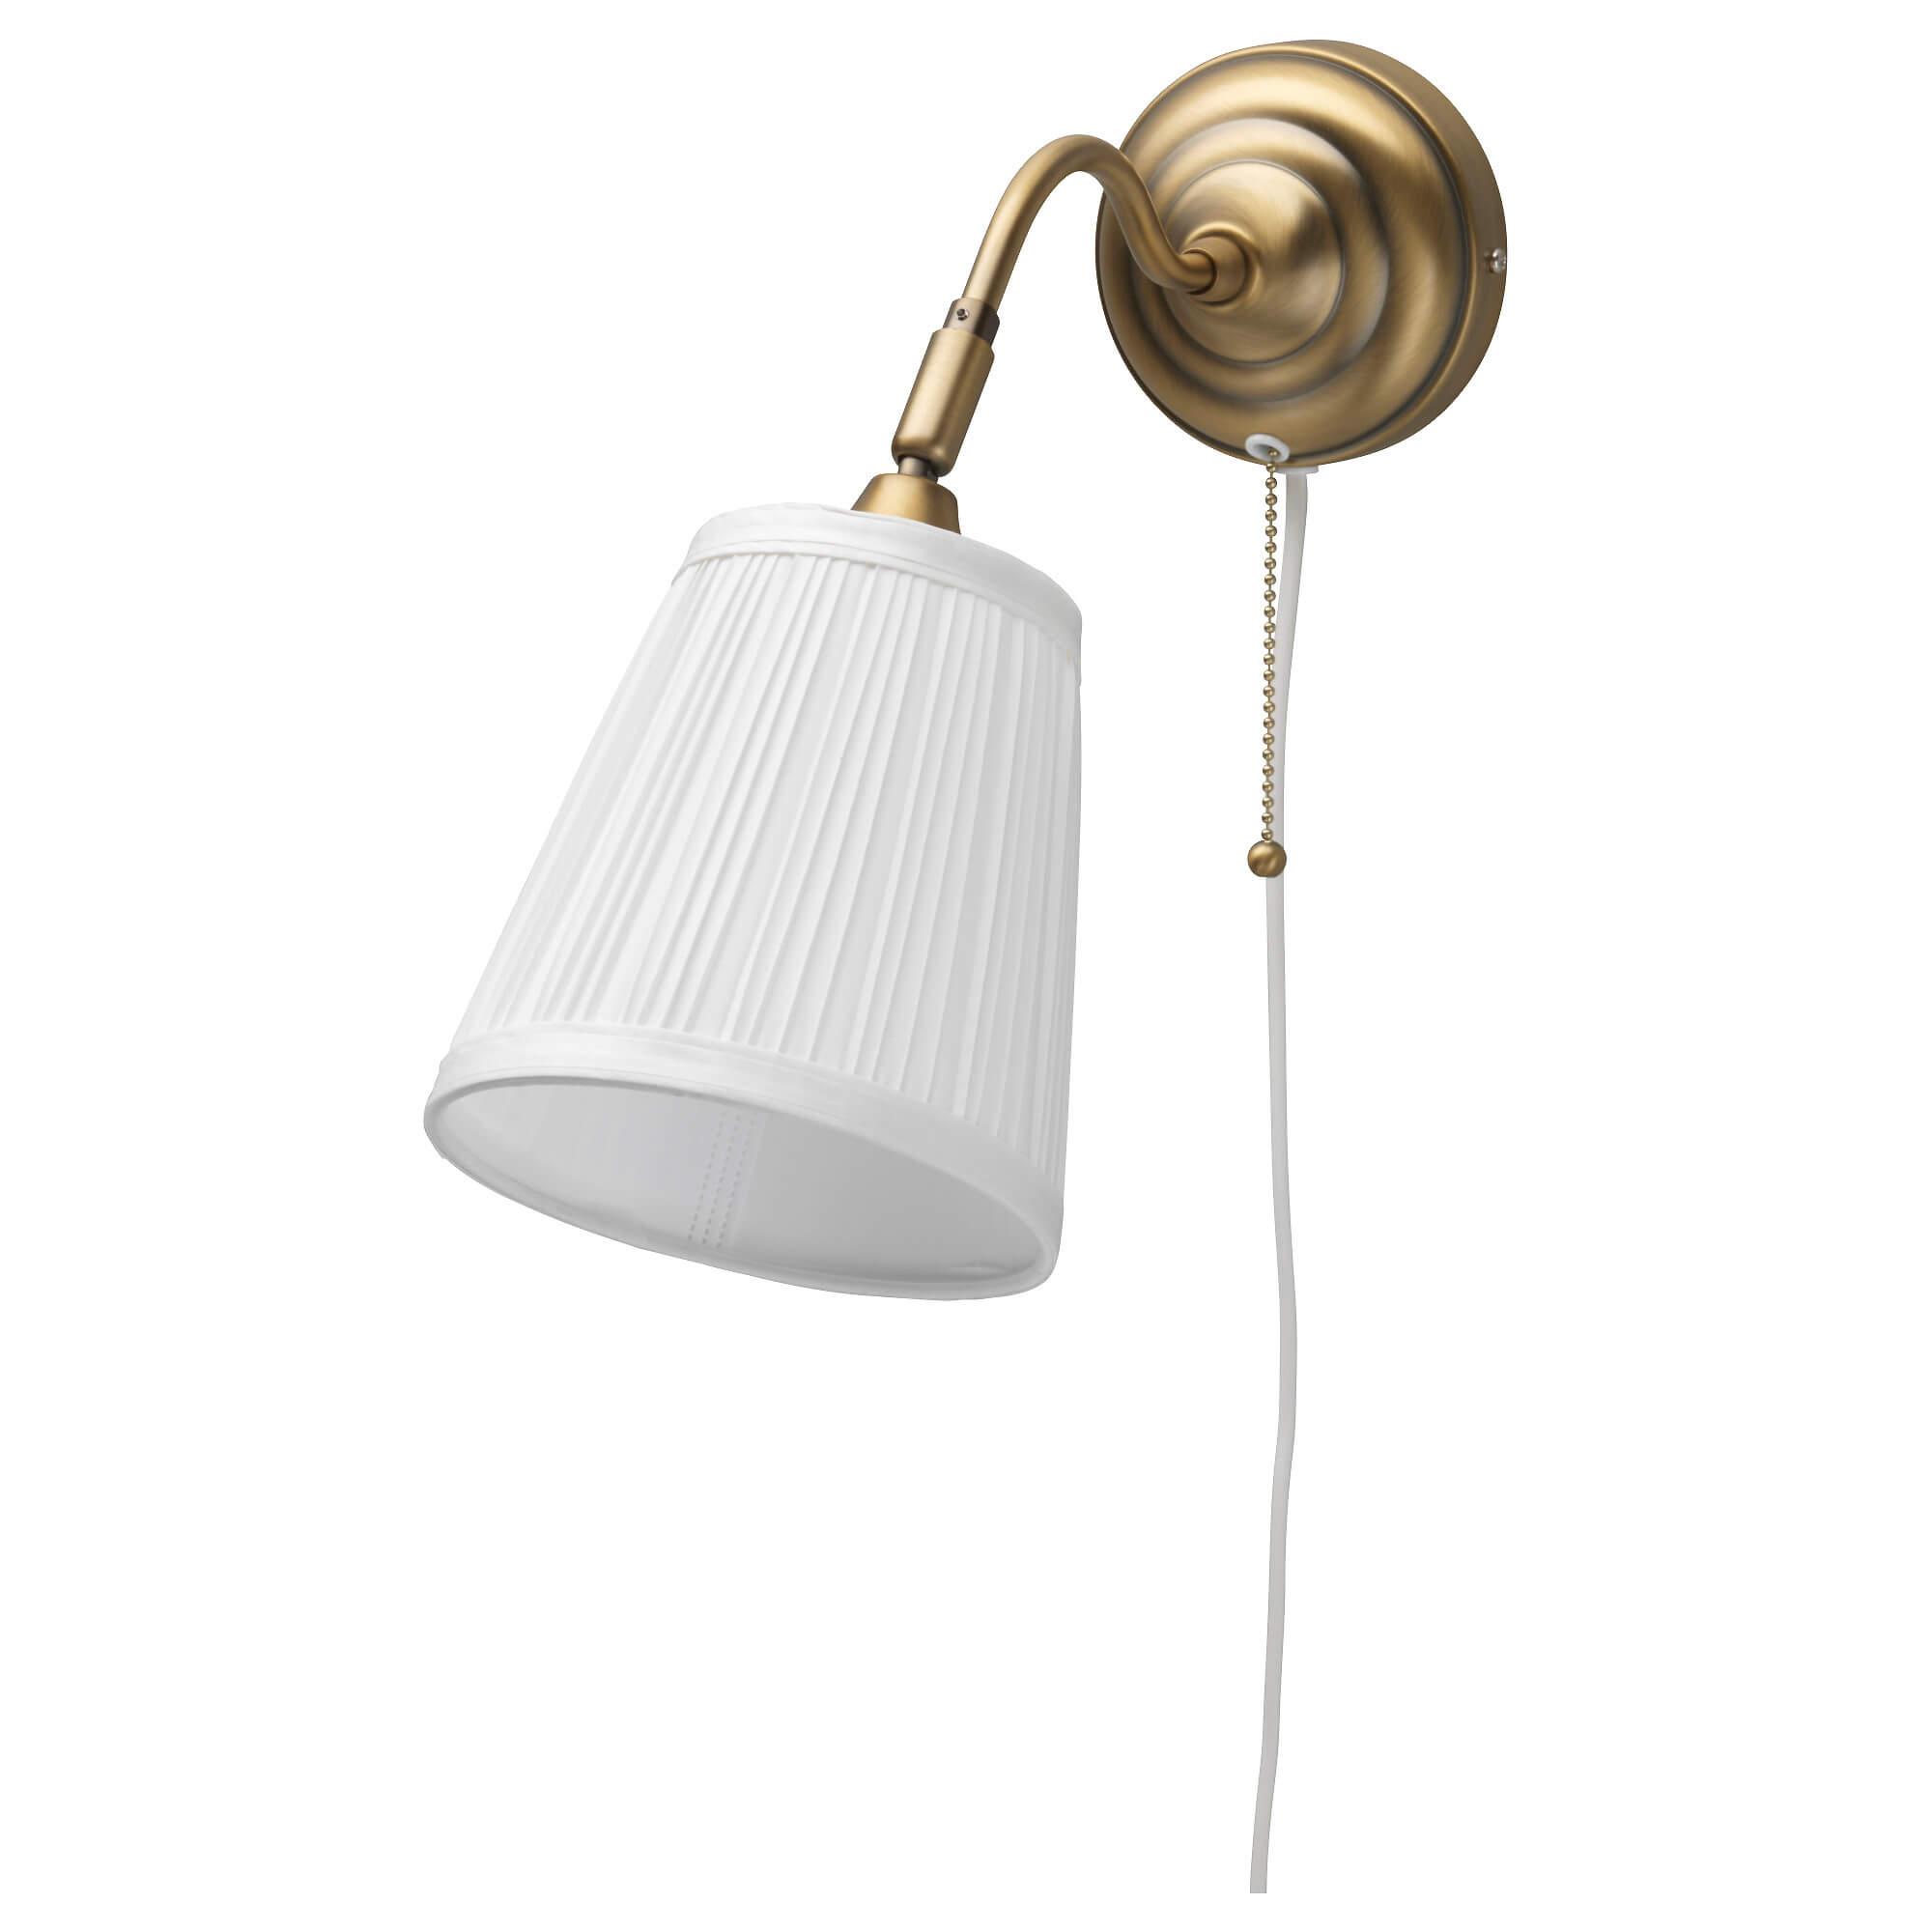 چراغ دیواری ایکیا - ARSTID